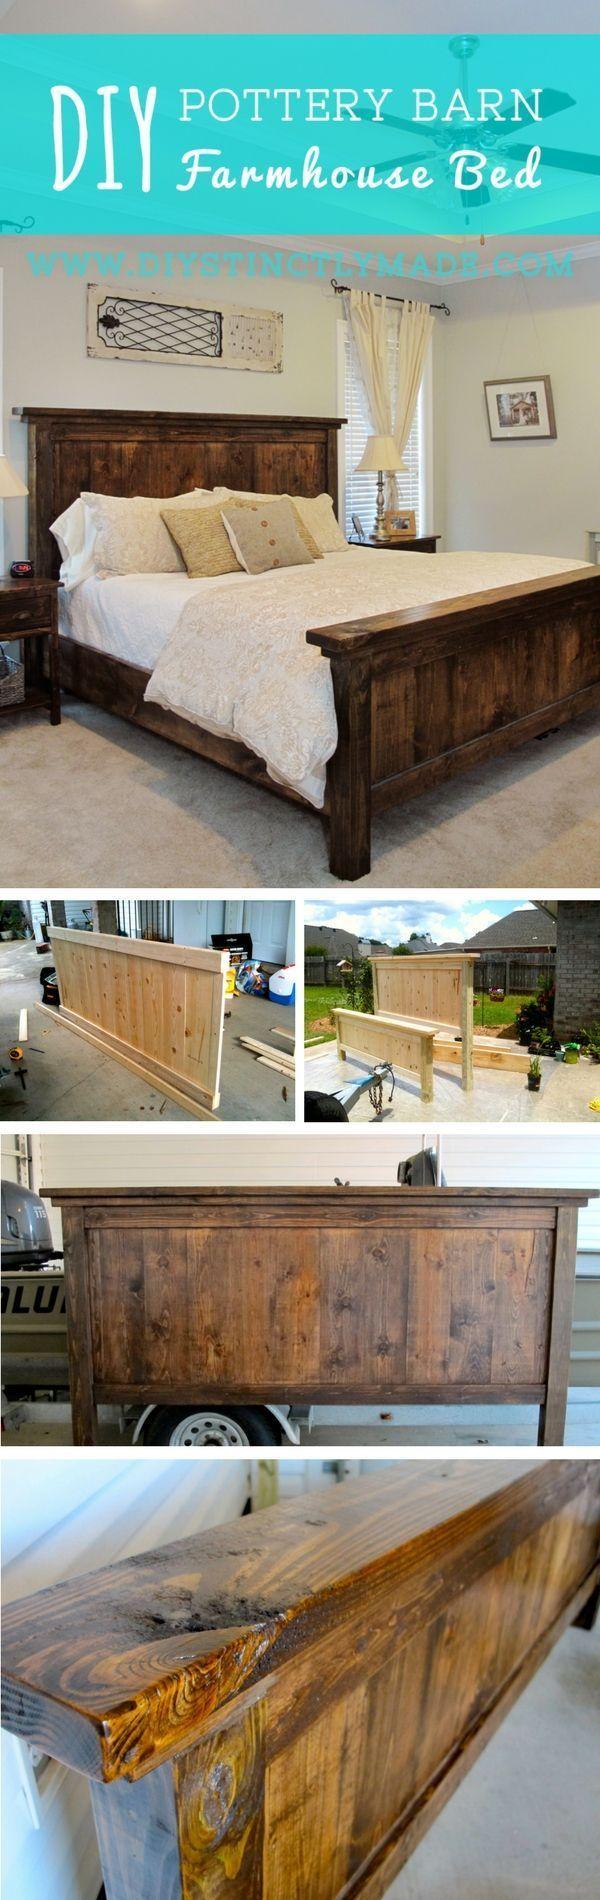 20 easy diy bed frame projects you can build on a budget - Diy Kingsizekopfteil Plne